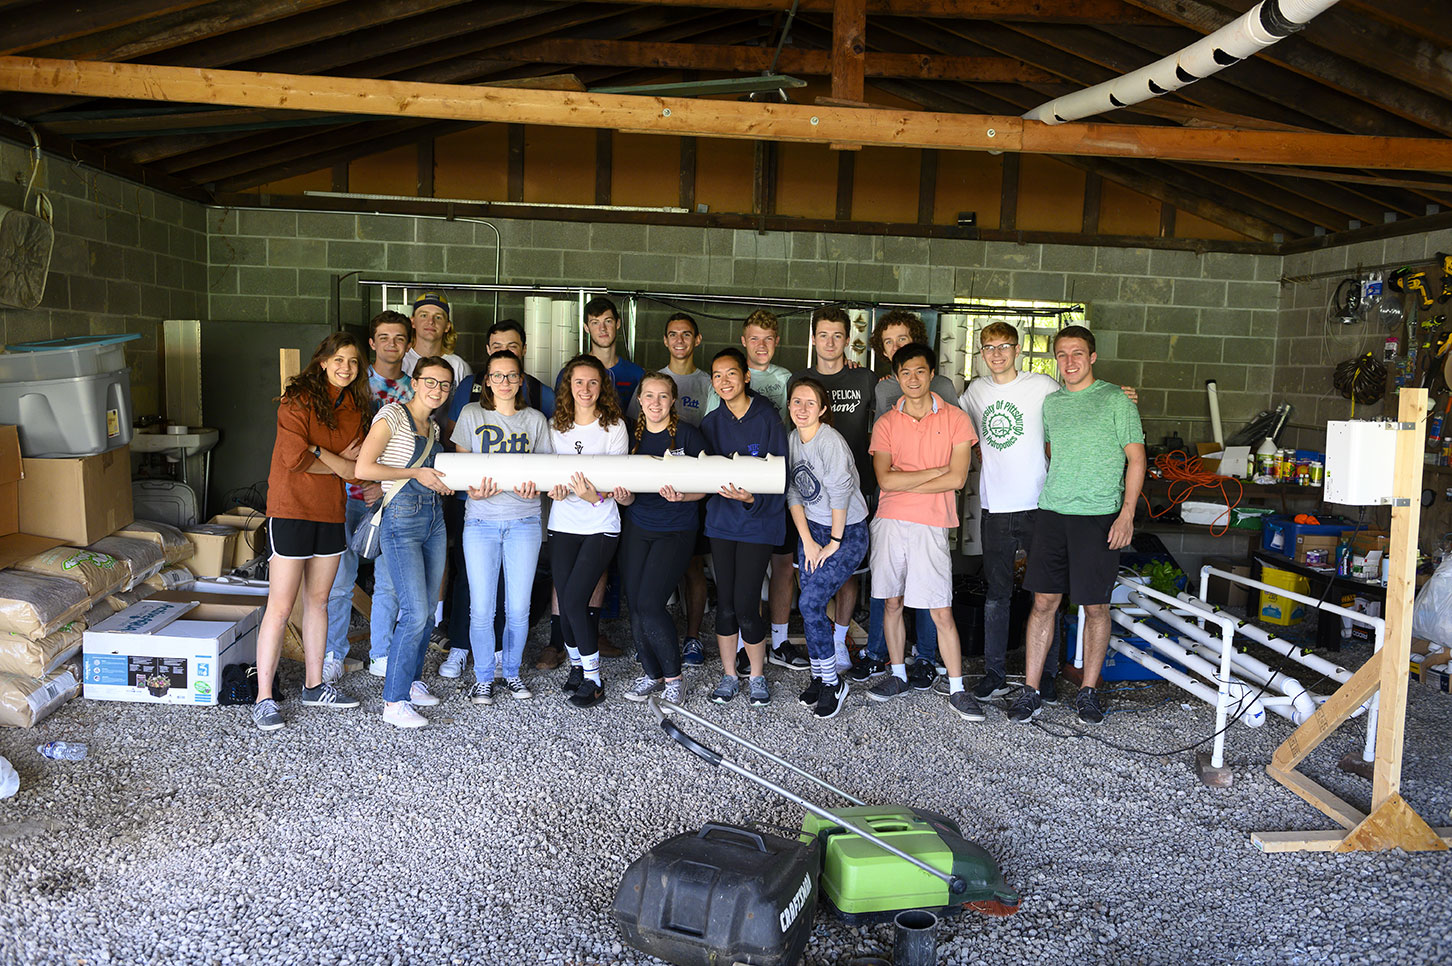 Community Changemakers: Pitt Hydroponics